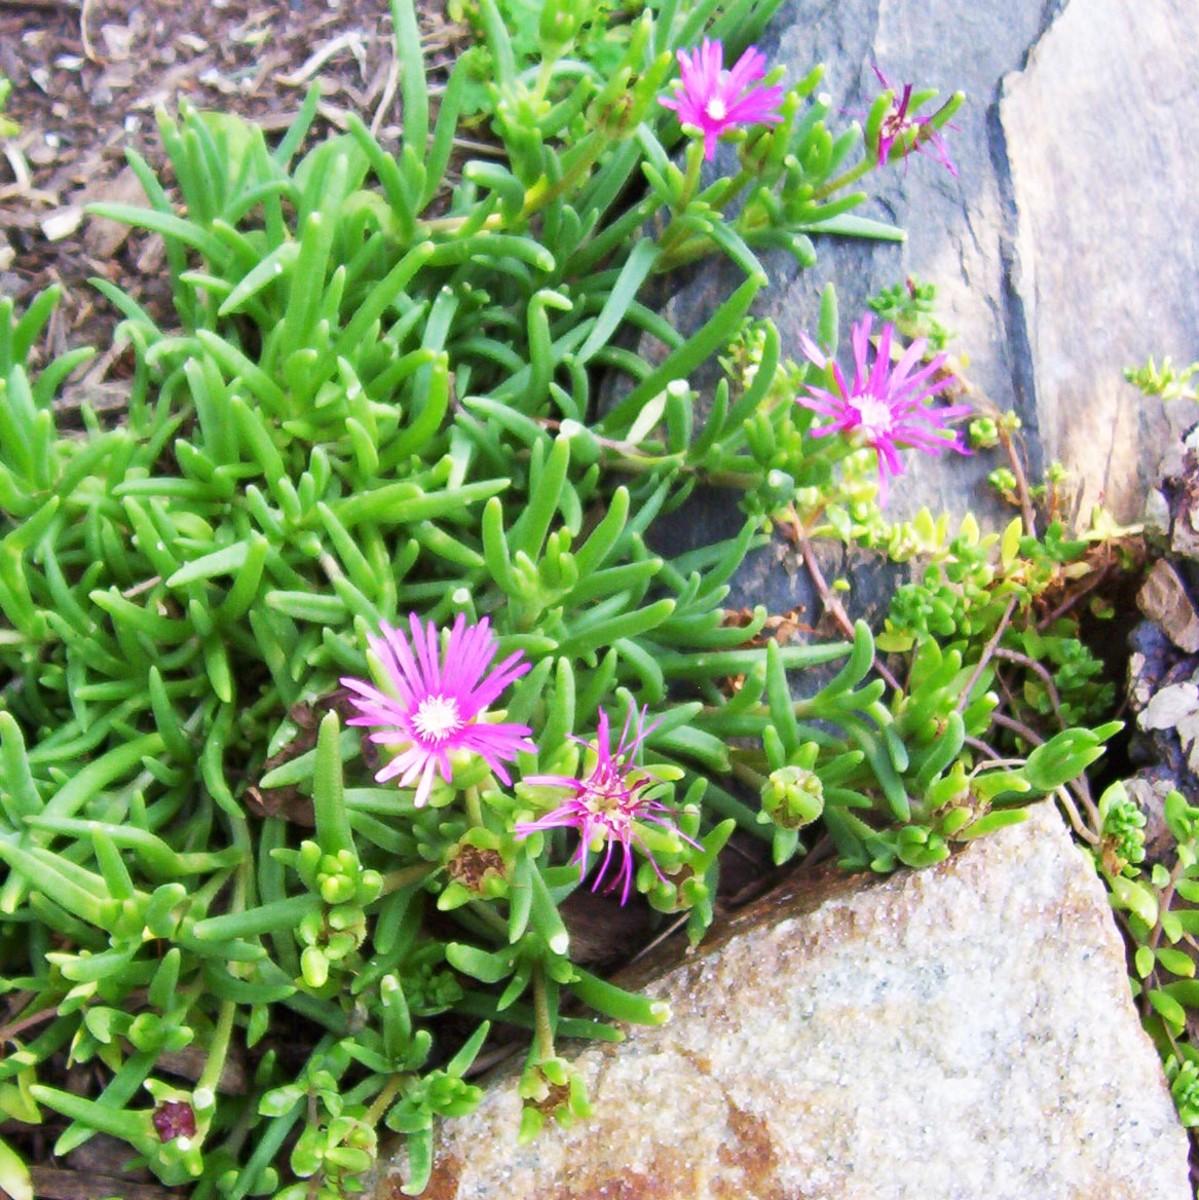 Ice plant or sedum (photo by Dolores Monet)